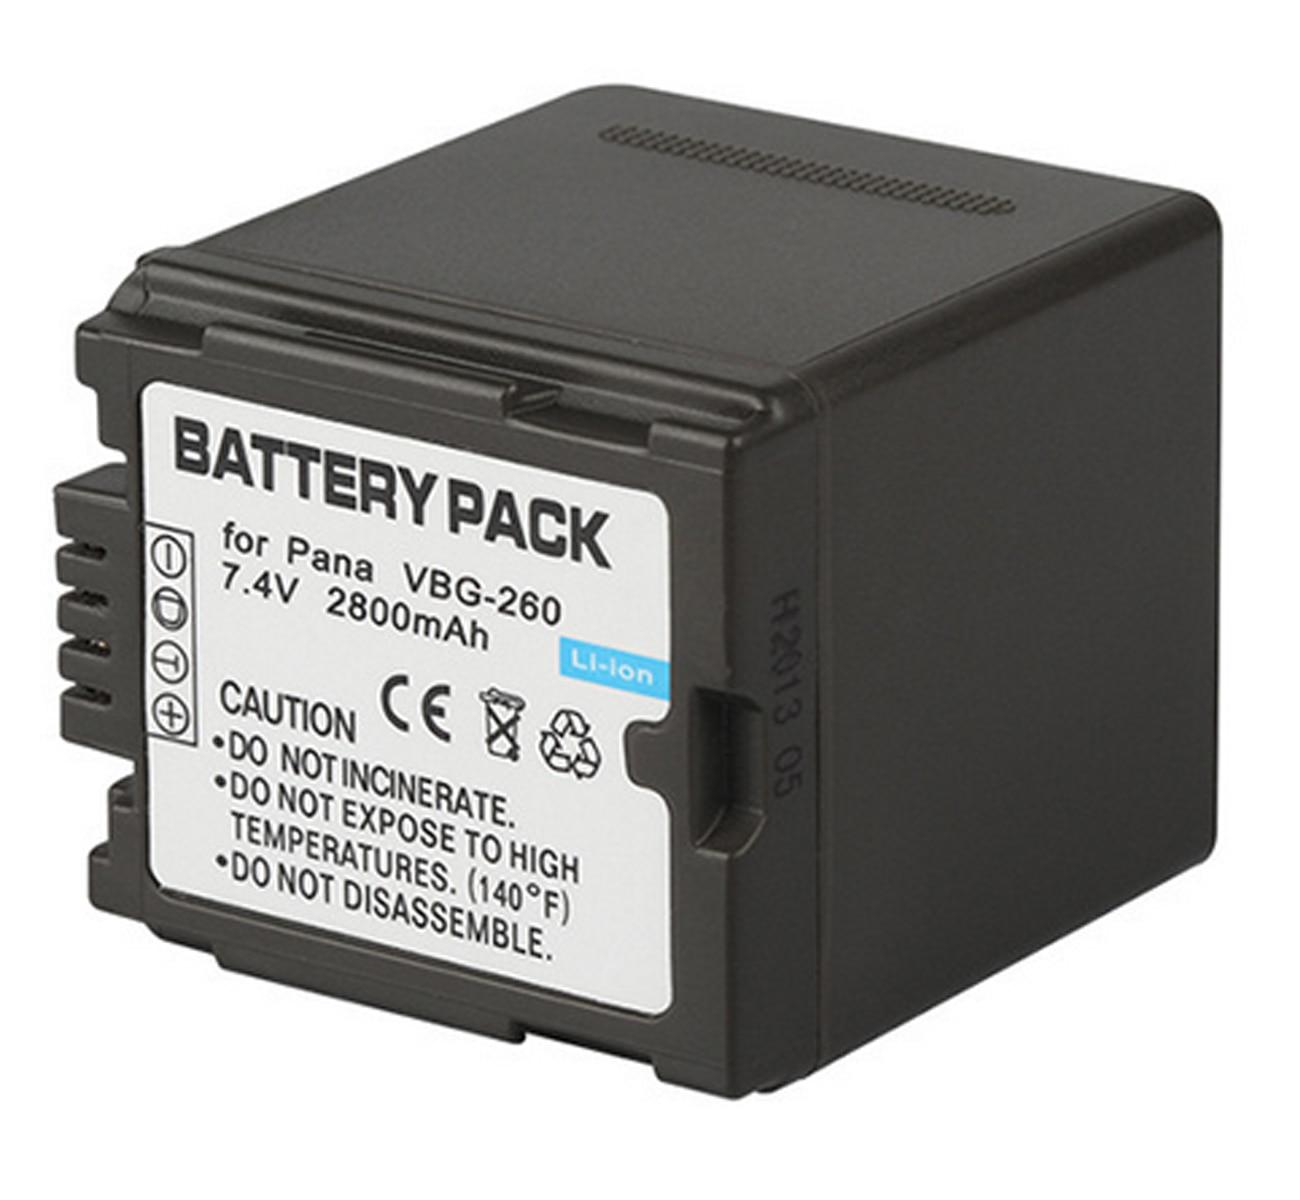 alpha-ene.co.jp Battery Charger for PANASONIC SDR-H40P SDR-H60P ...